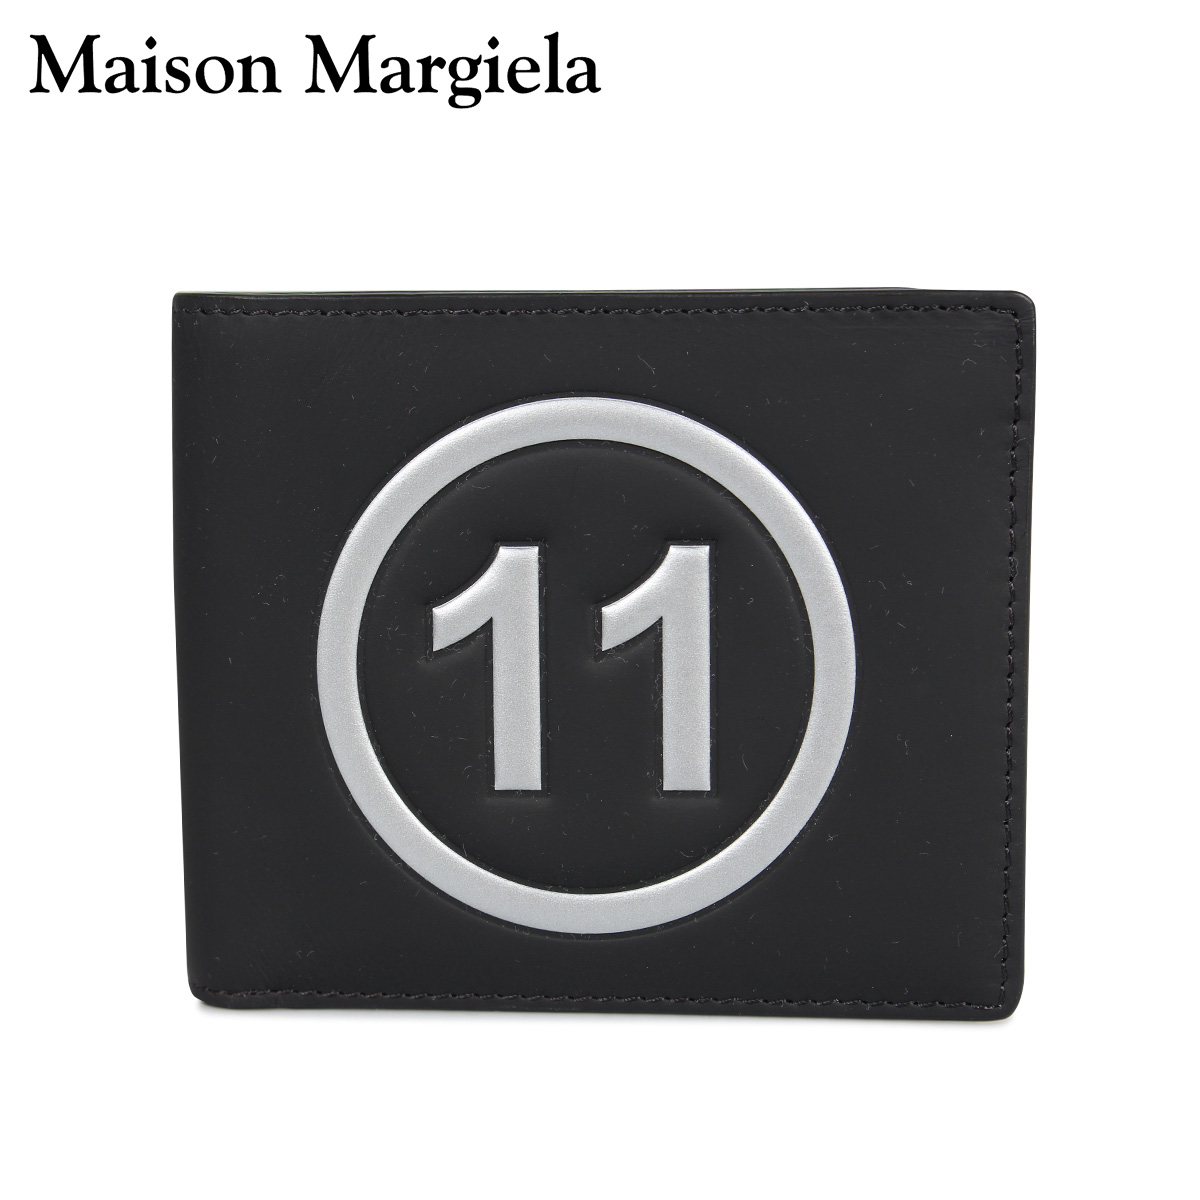 MAISON MARGIELA メゾンマルジェラ 財布 ミニ財布 二つ折り メンズ レディース BI-FOLD WALLET レザー ブラック 黒 S35UI0435 P0047